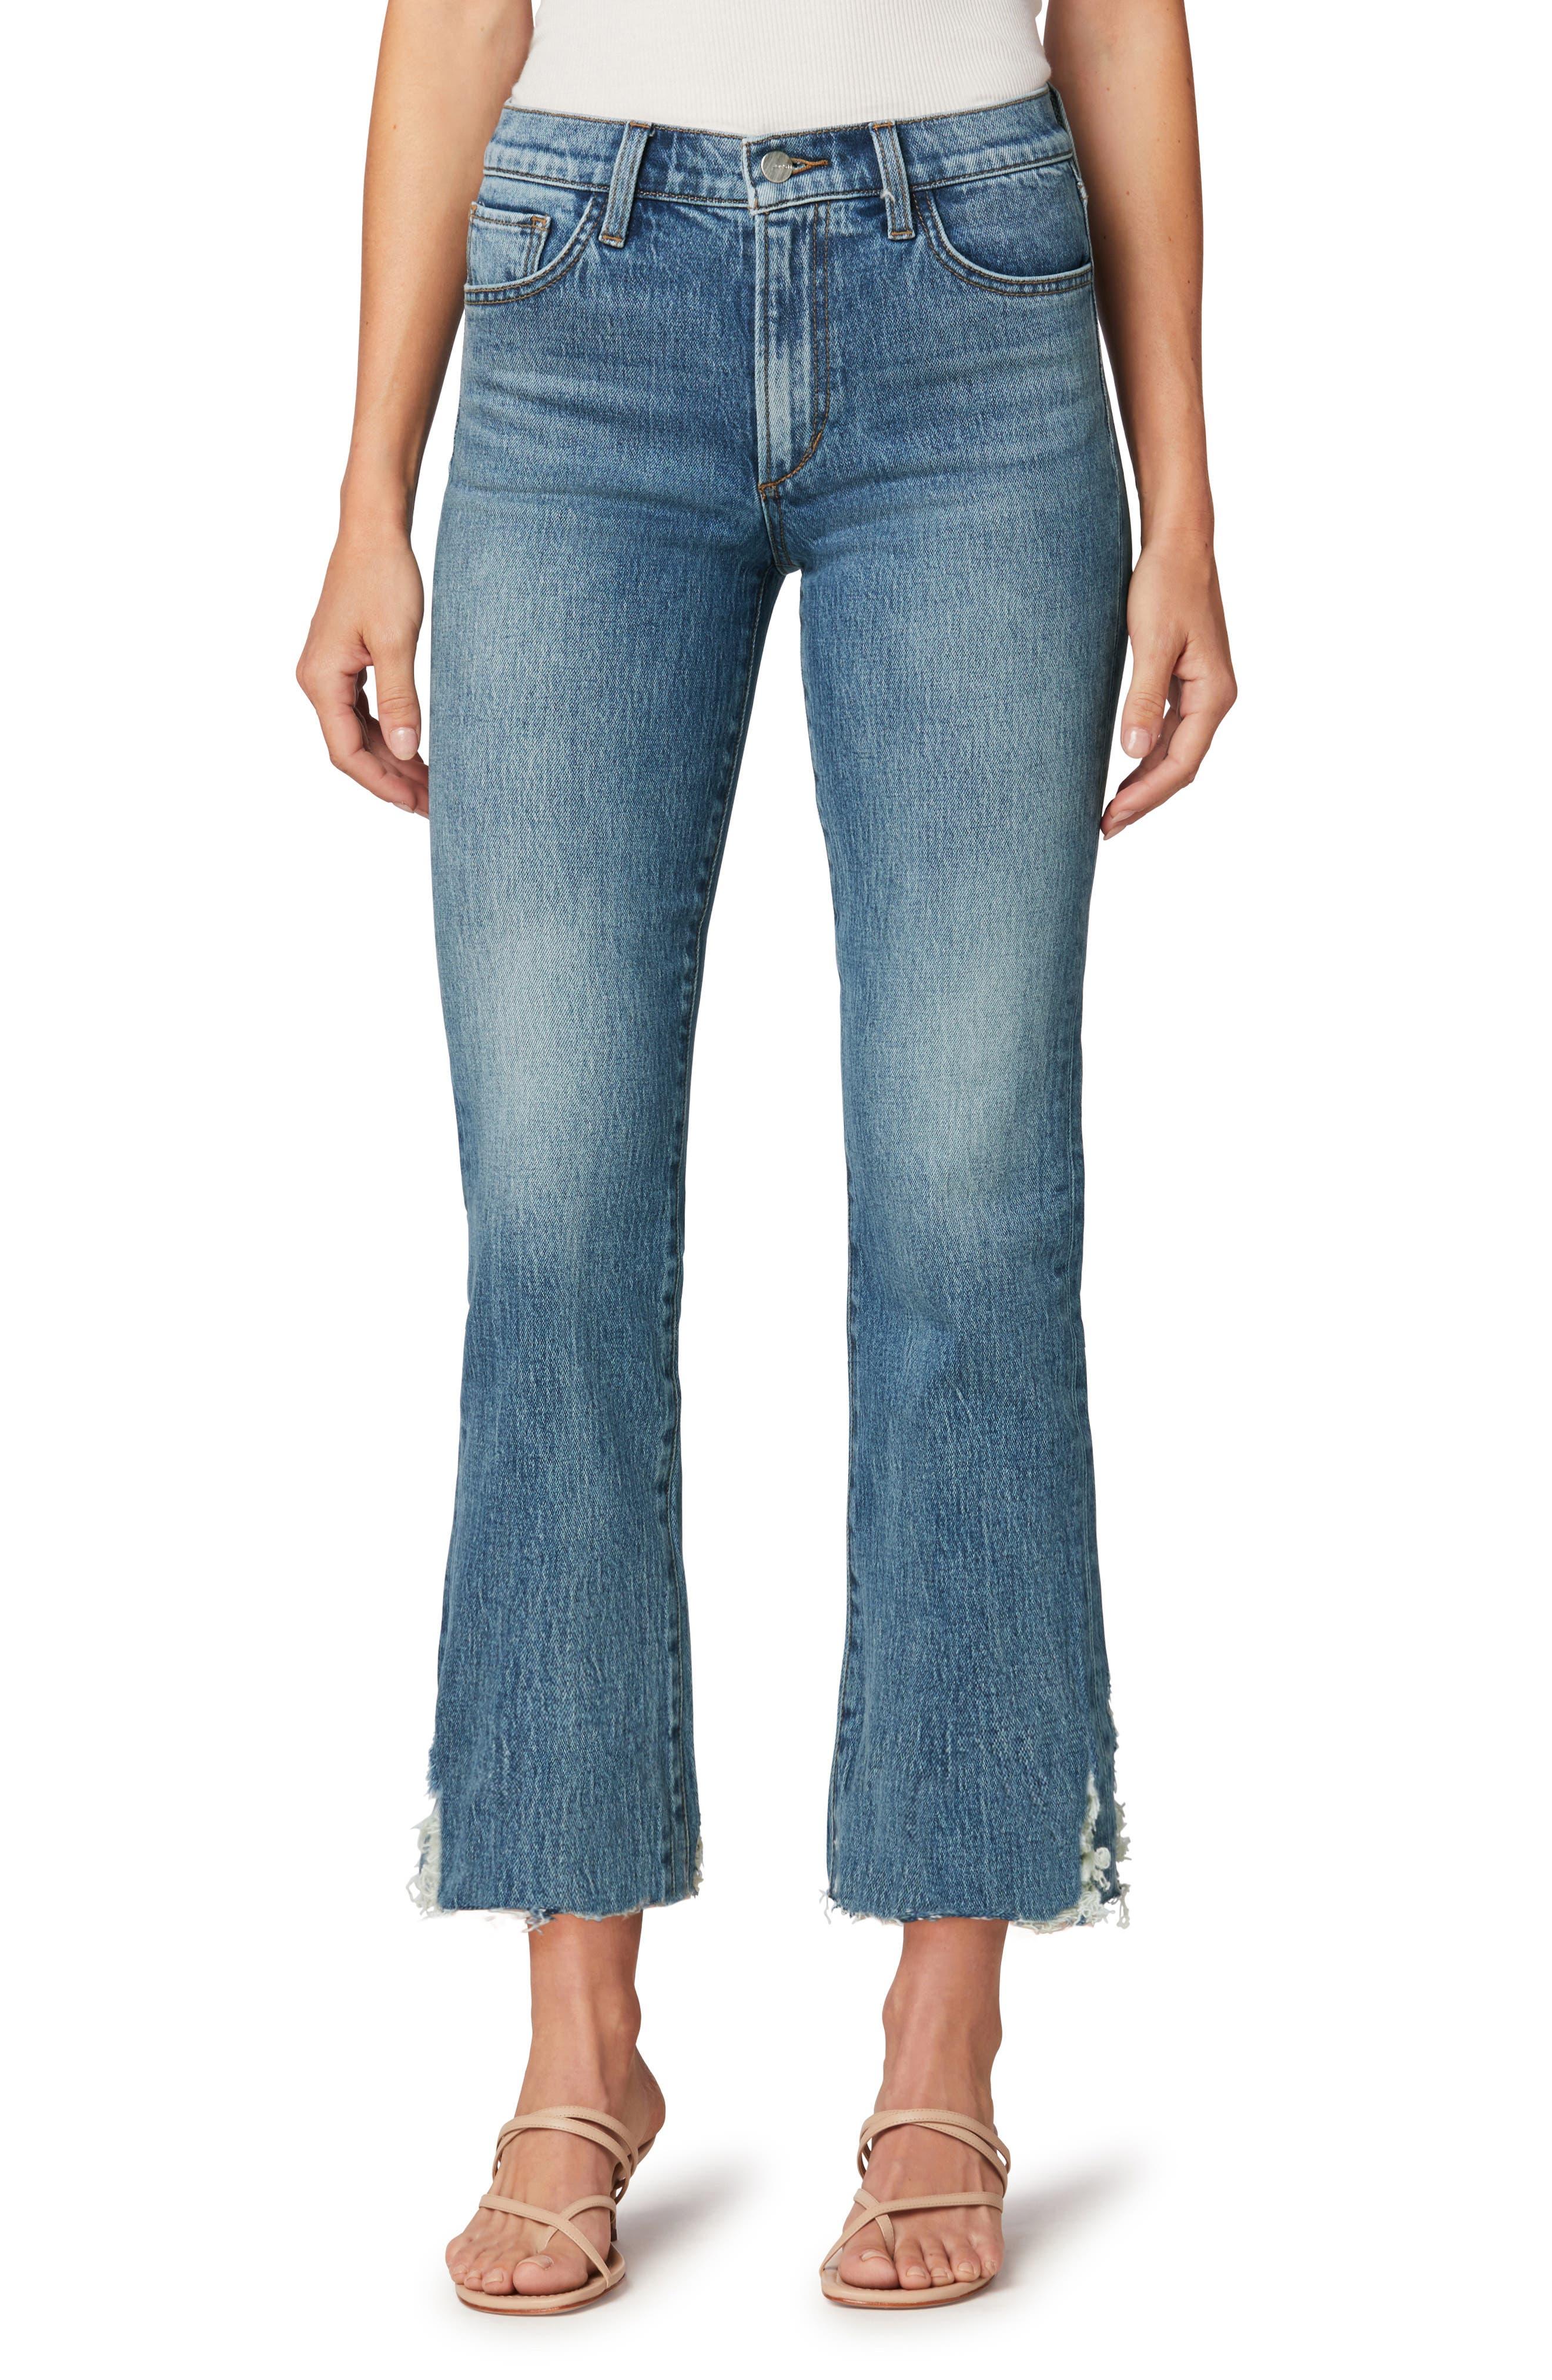 The Callie High Waist Cutoff Crop Bootcut Jeans